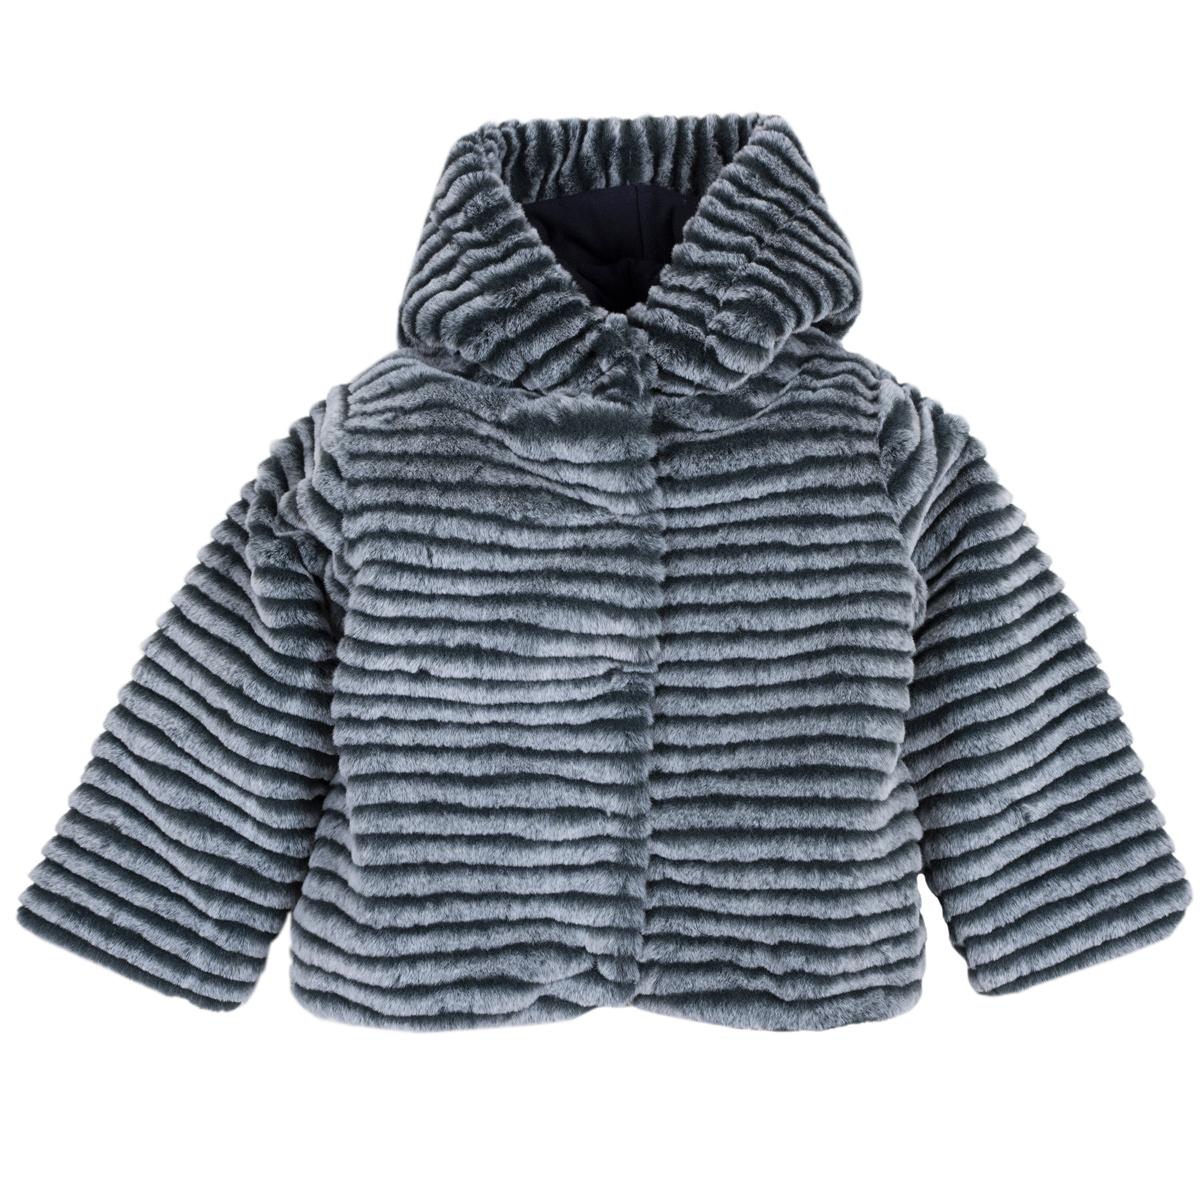 Jacheta copii Chicco, blana artificiala, 96988